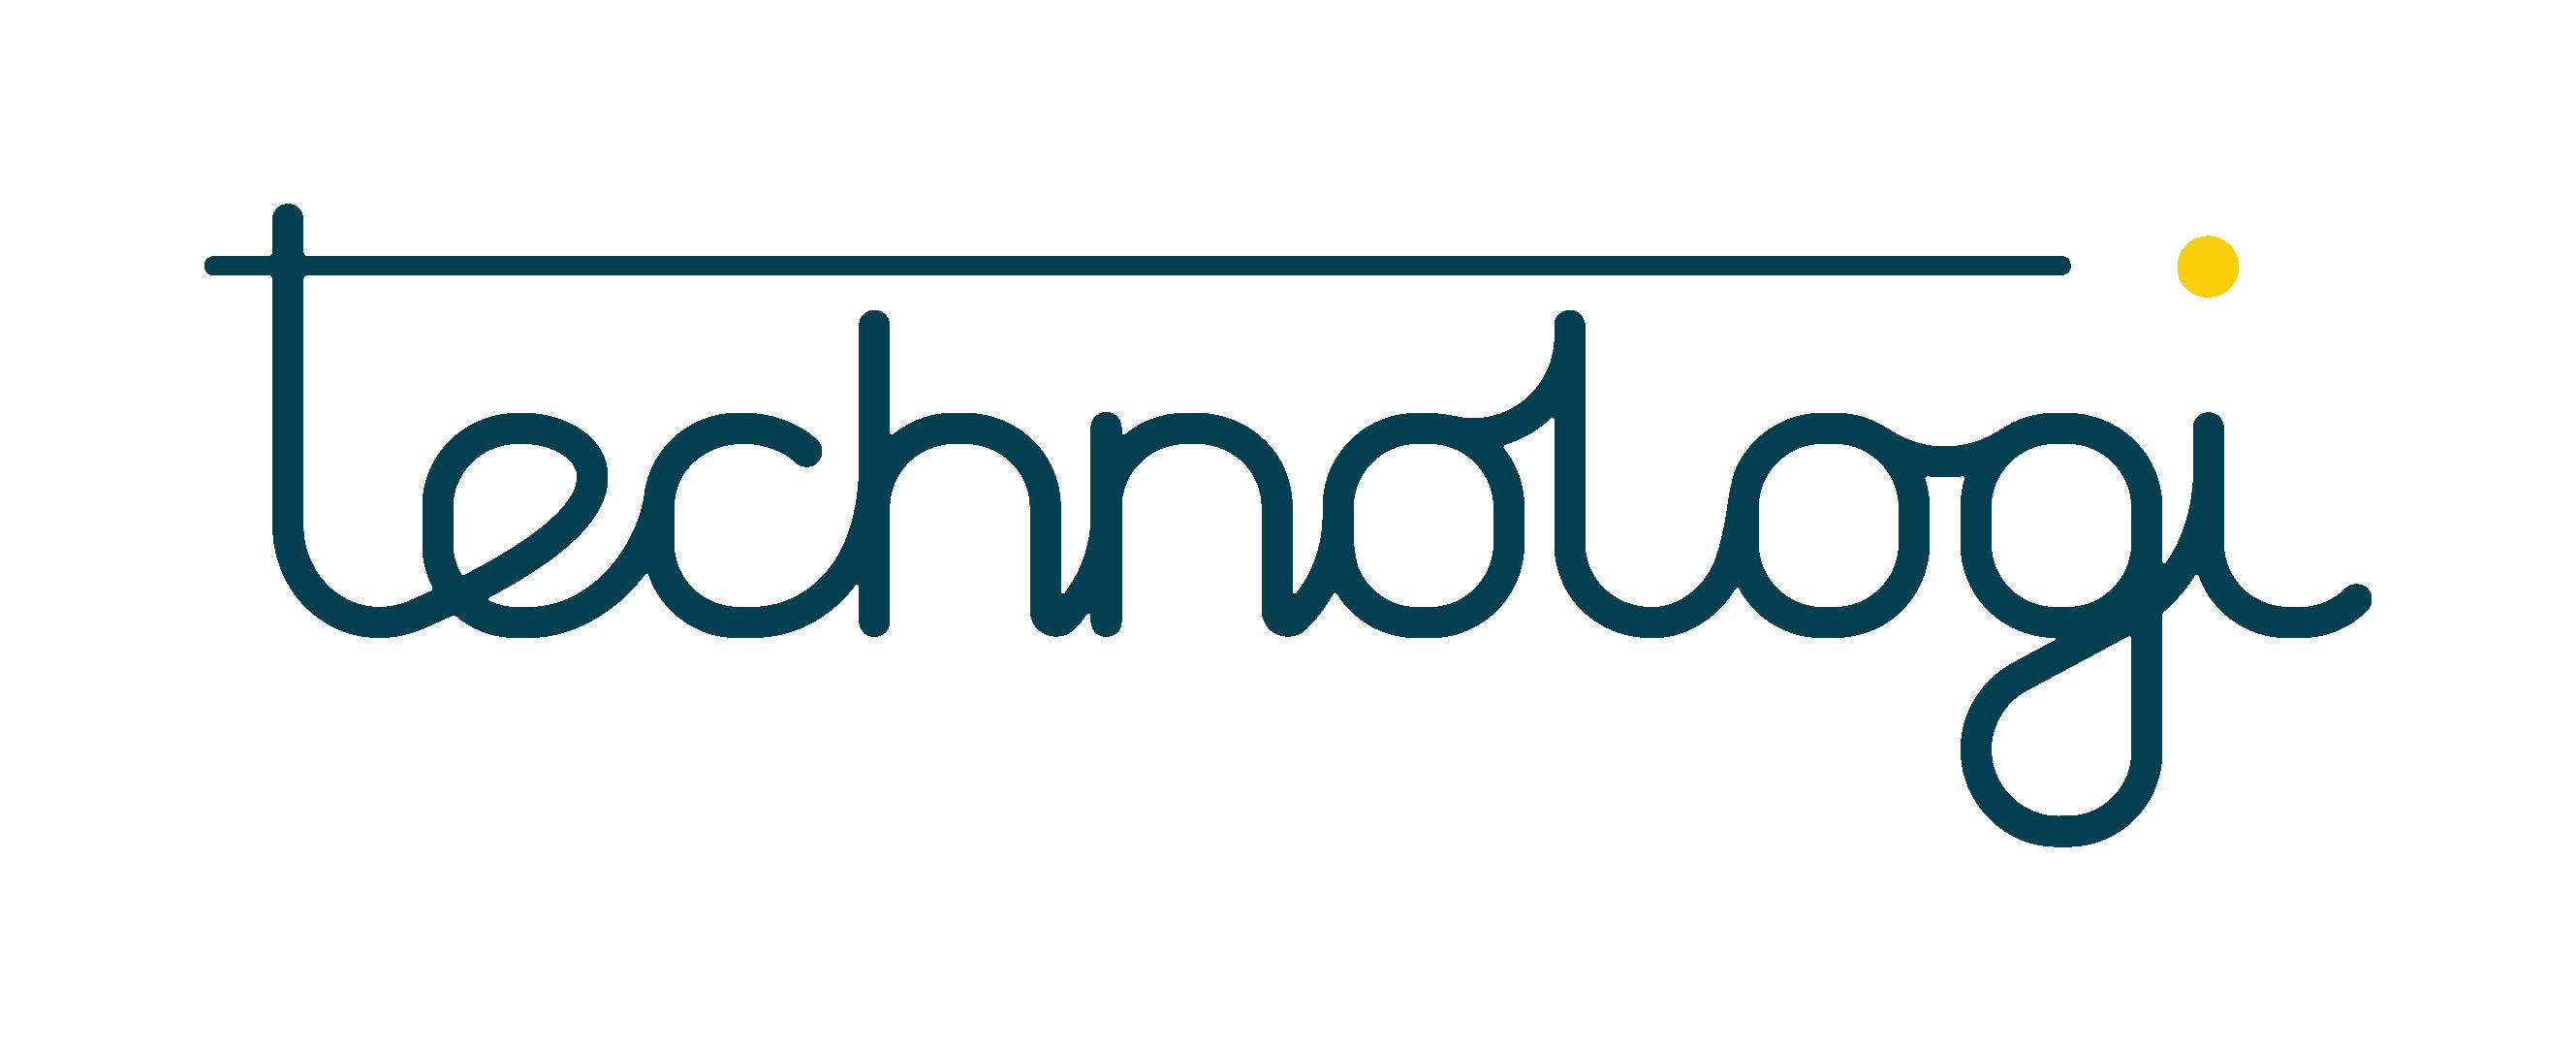 technologi